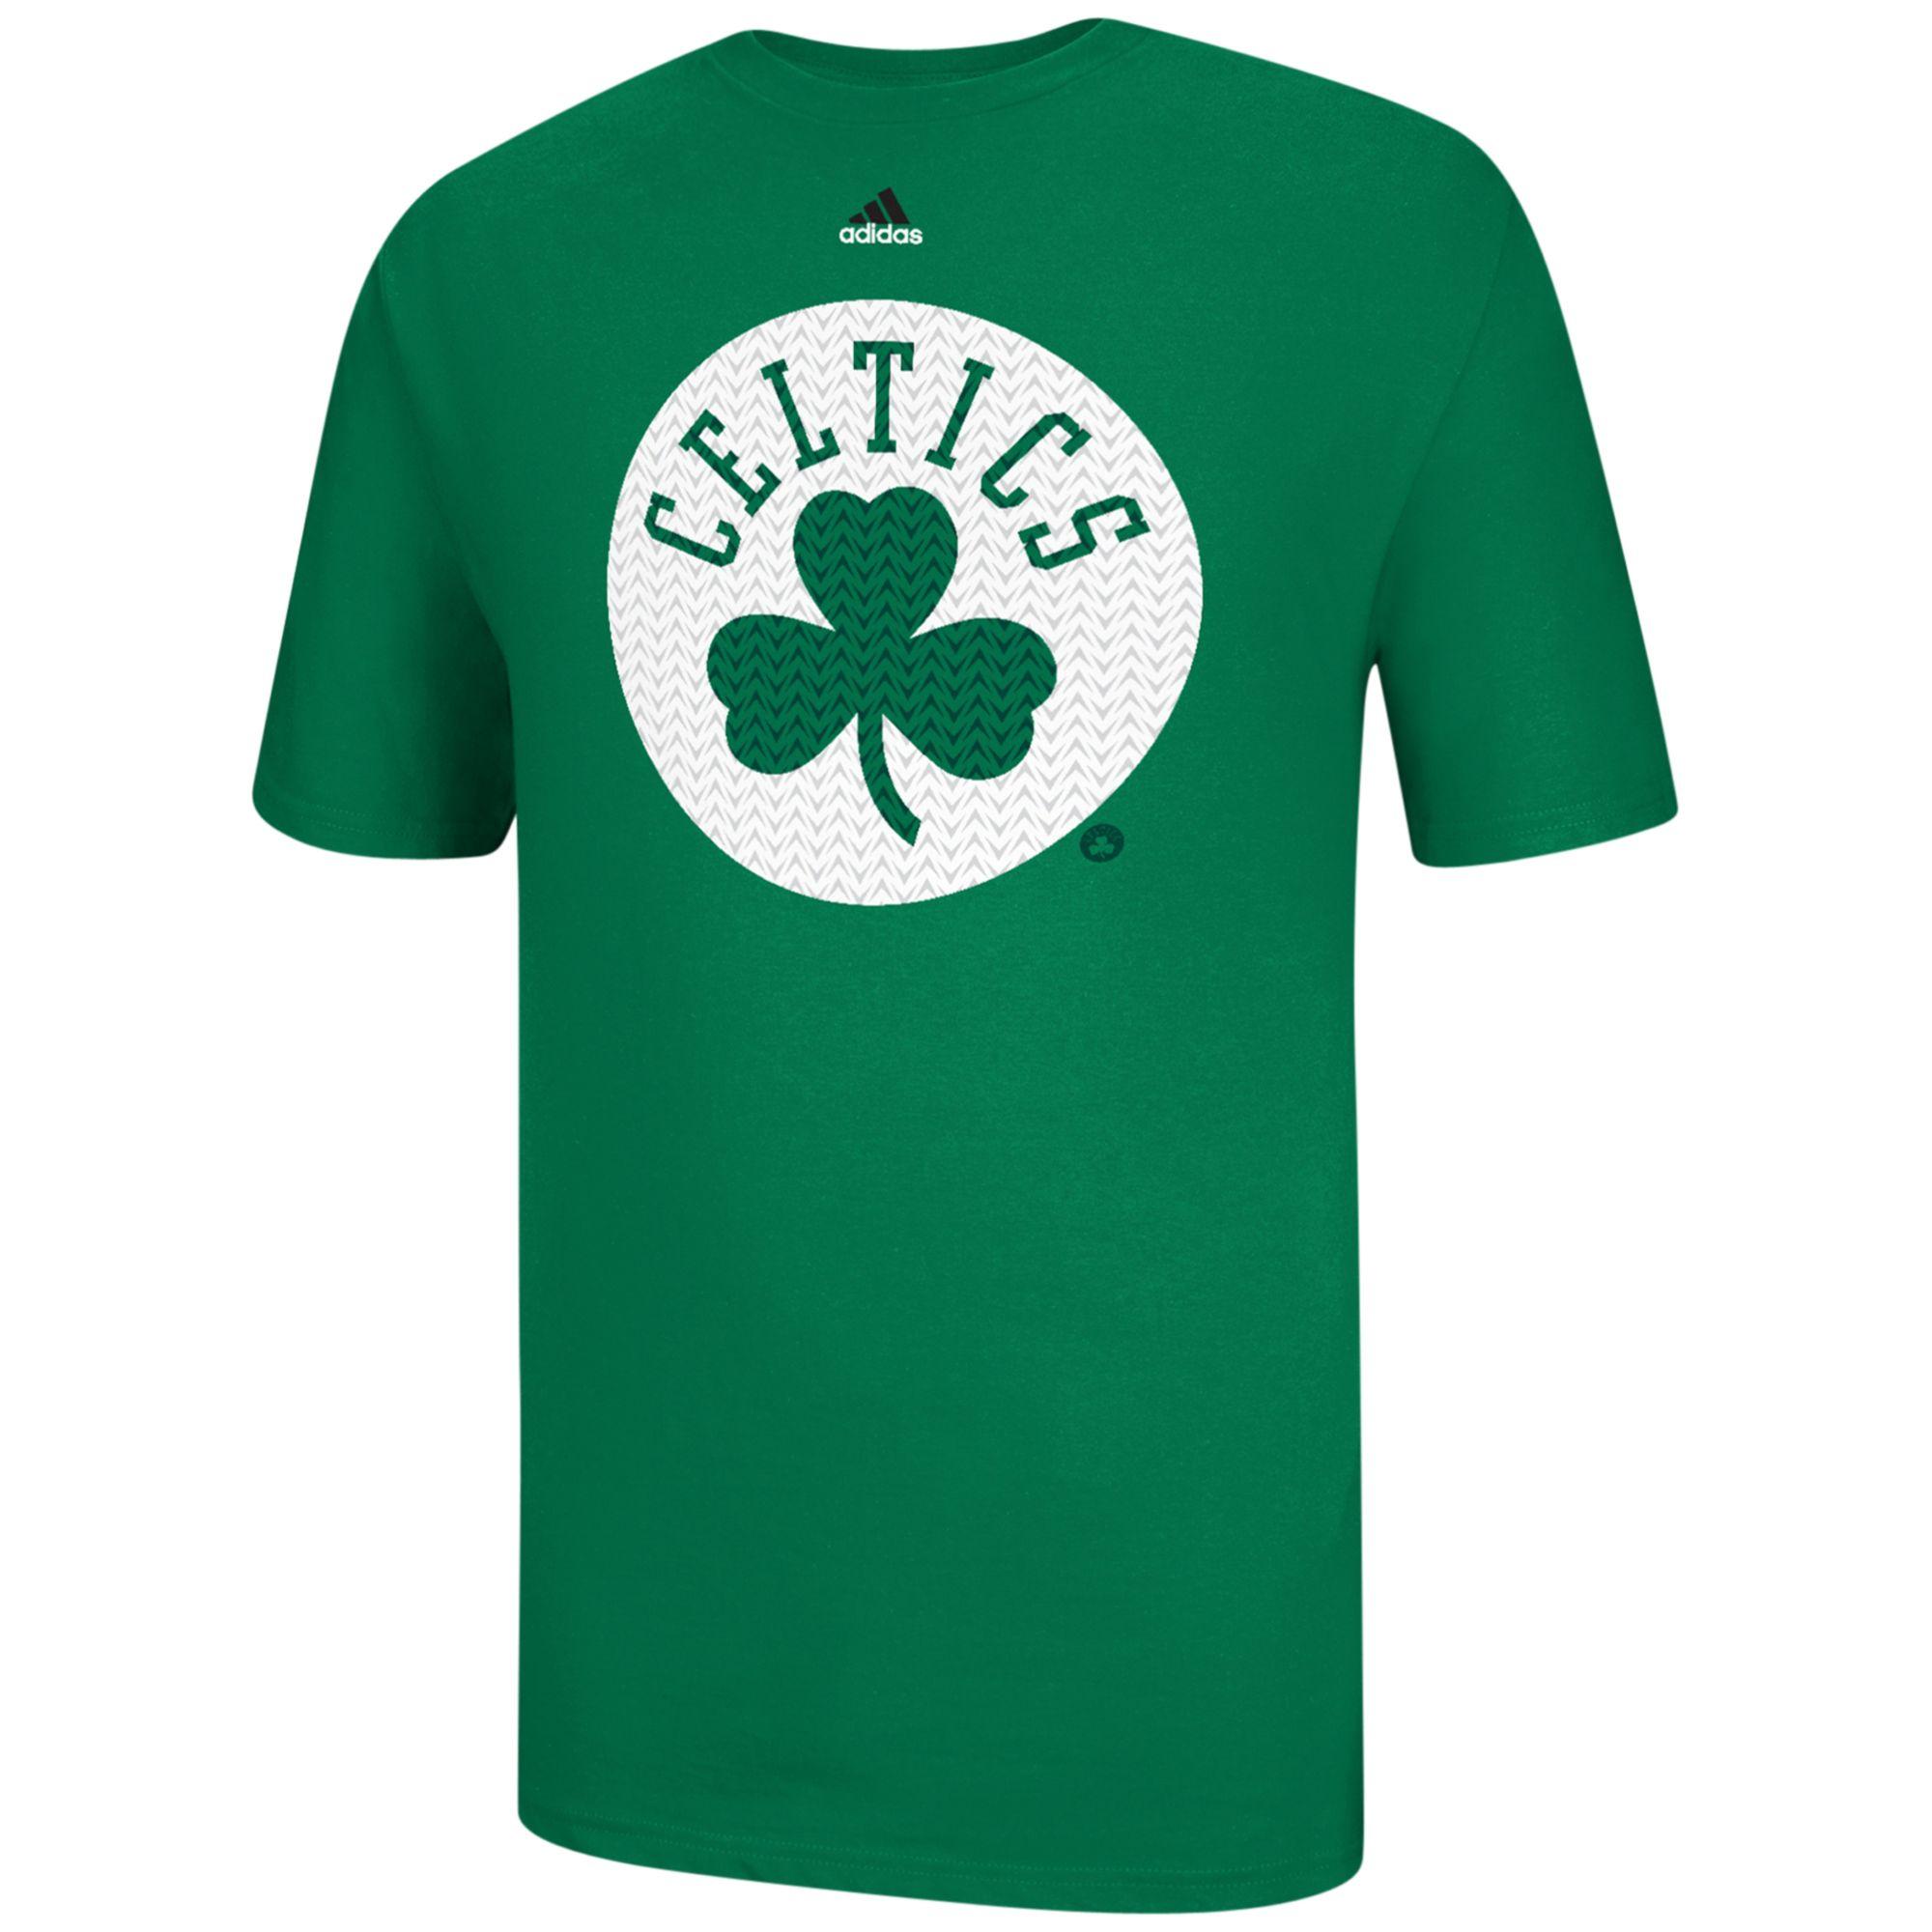 Adidas Men 39 S Short Sleeve Boston Celtics Go To T Shirt In